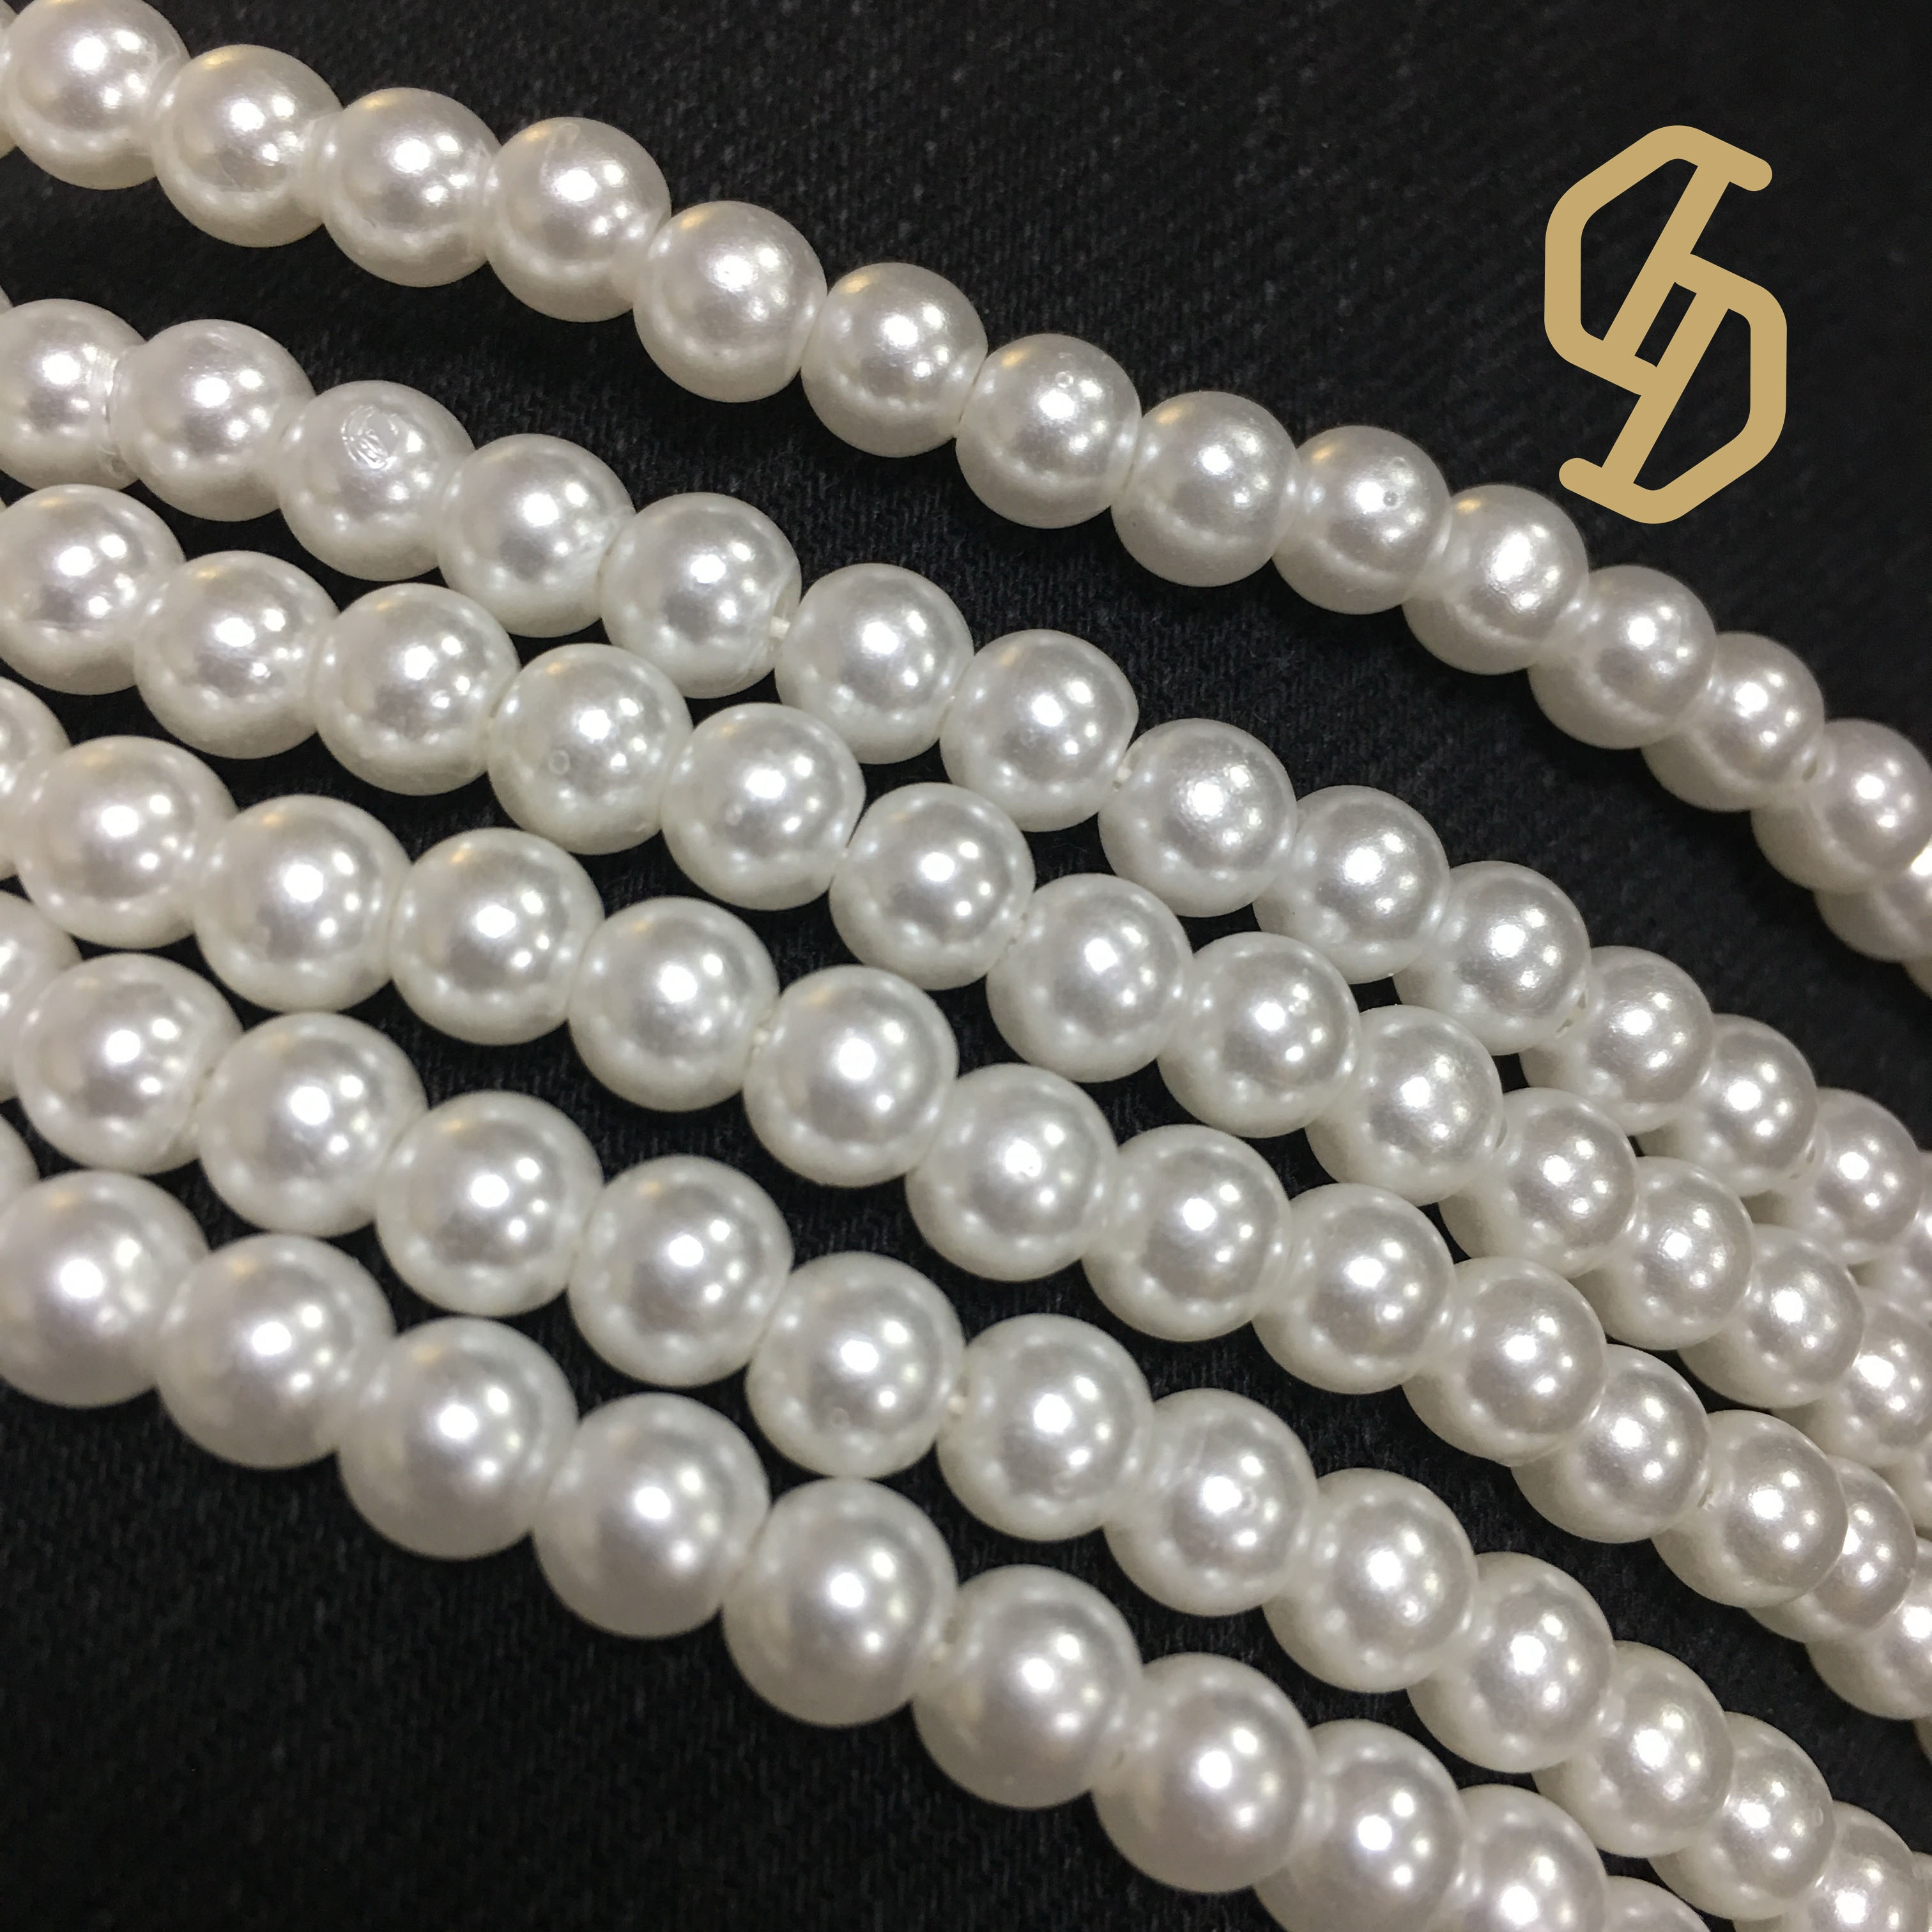 3-8mm Silver Gold Half Pearl Flatback Decor Scrapbook Bead DIY Craft